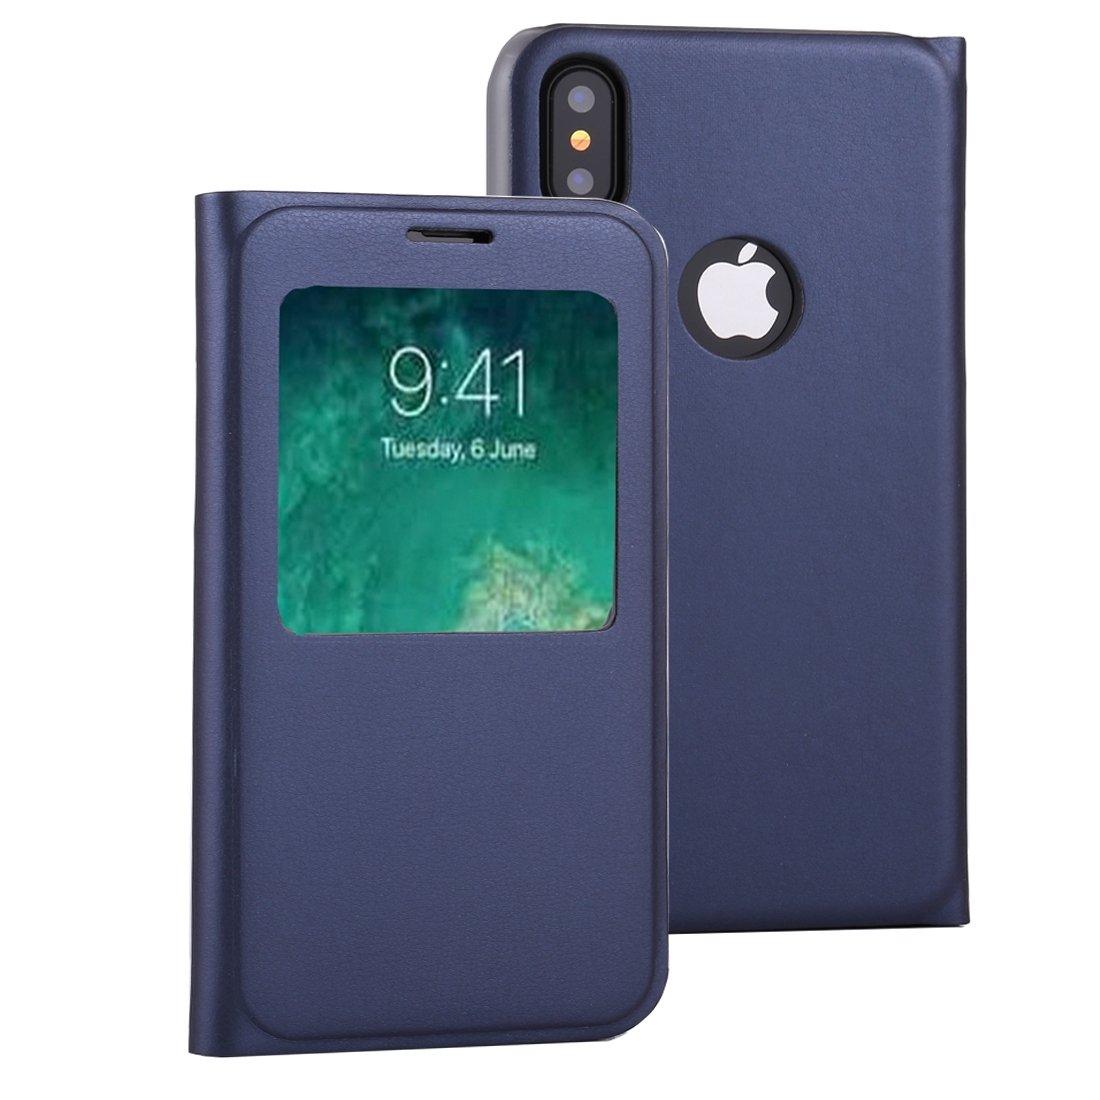 reputable site dbb72 bd245 Amazon.com: GR Horizontal Flip Leather Case Call Display ID iPhone X ...